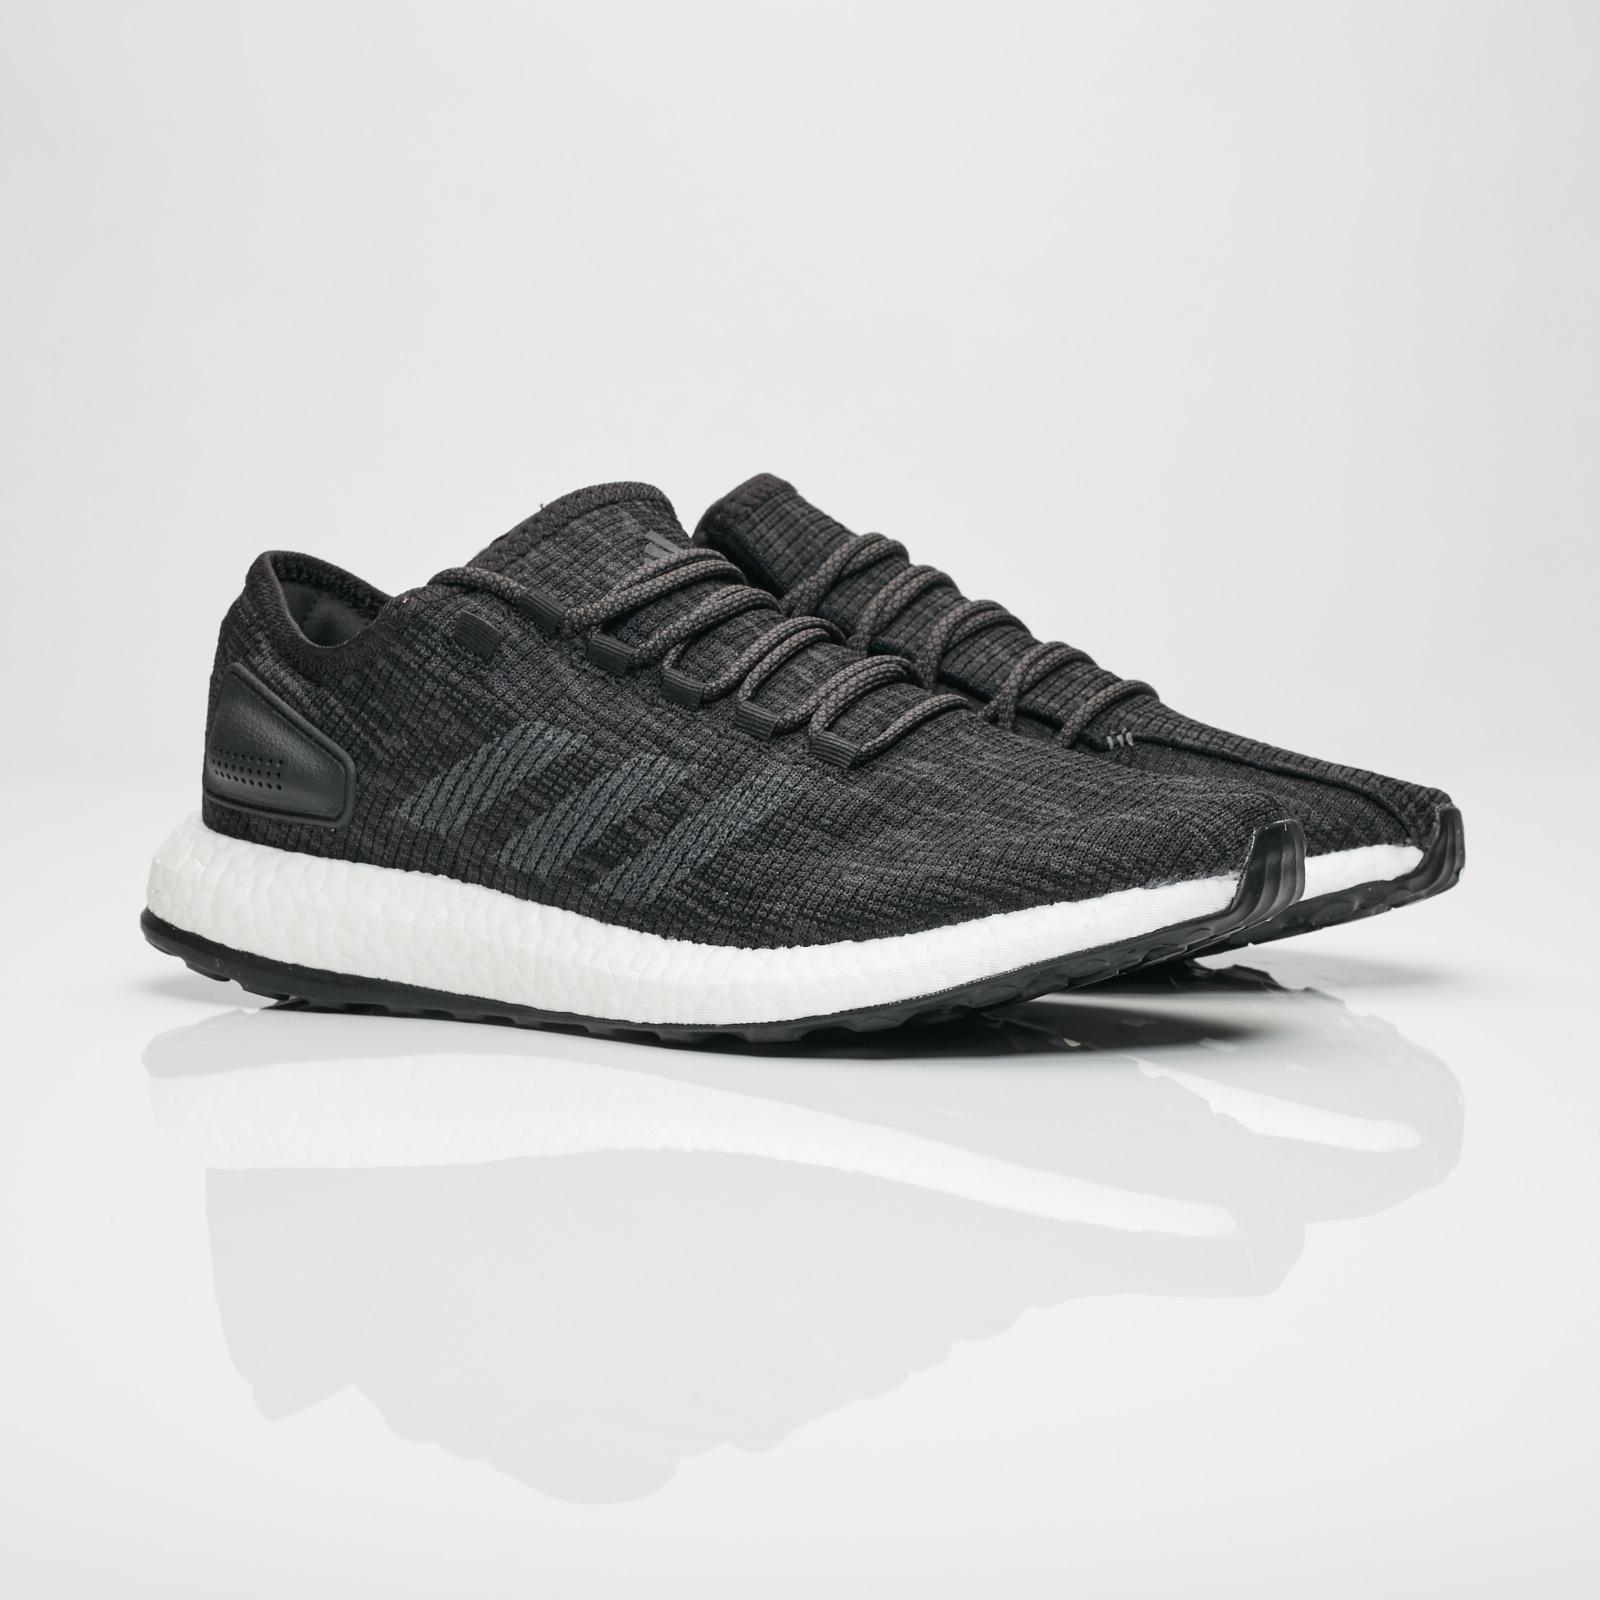 b46e9e8d4377b adidas PureBOOST - Cp9326 - Sneakersnstuff